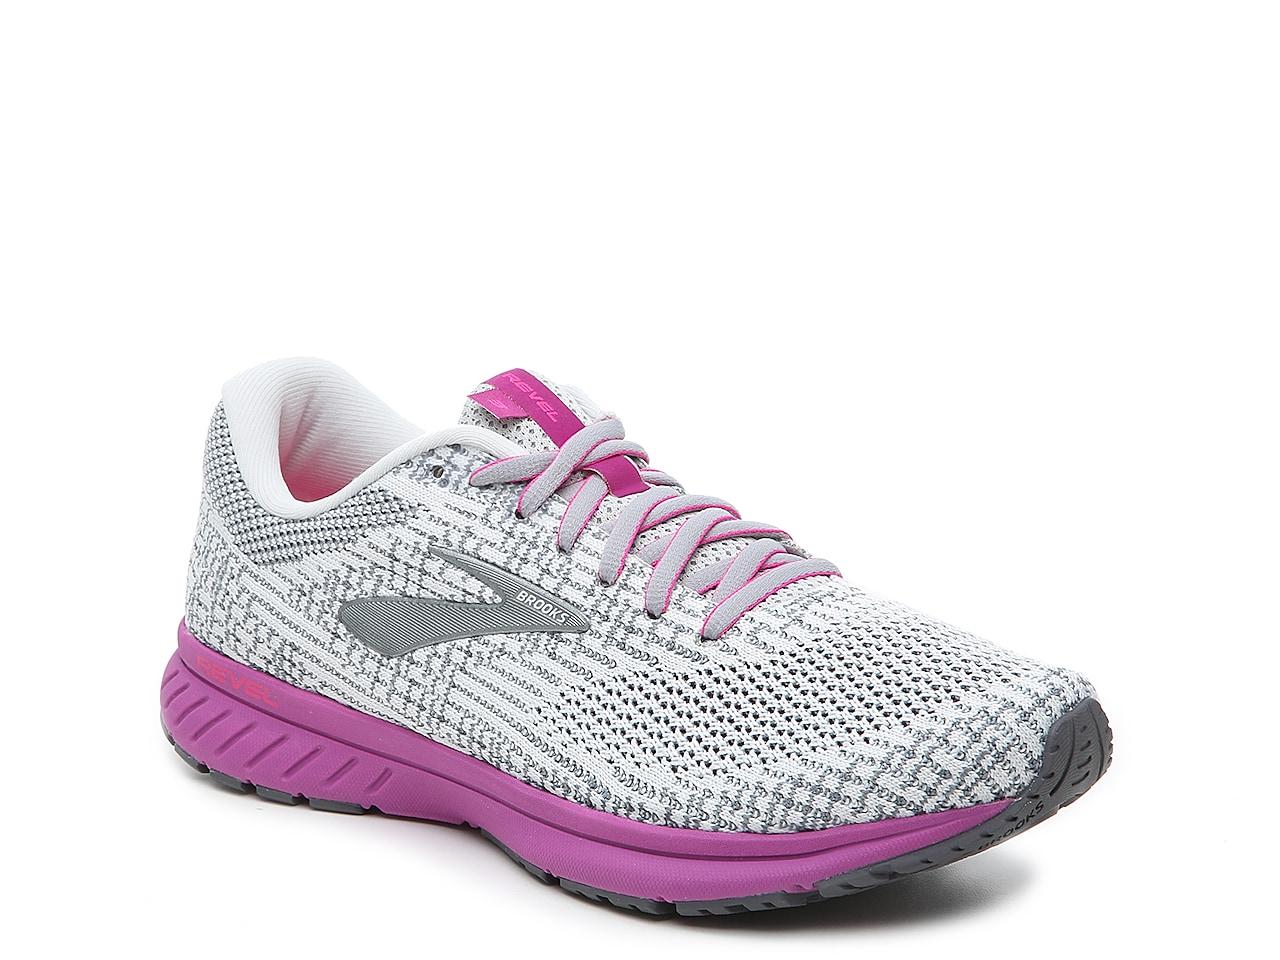 Brooks Revel 3 Running Shoe - Women's